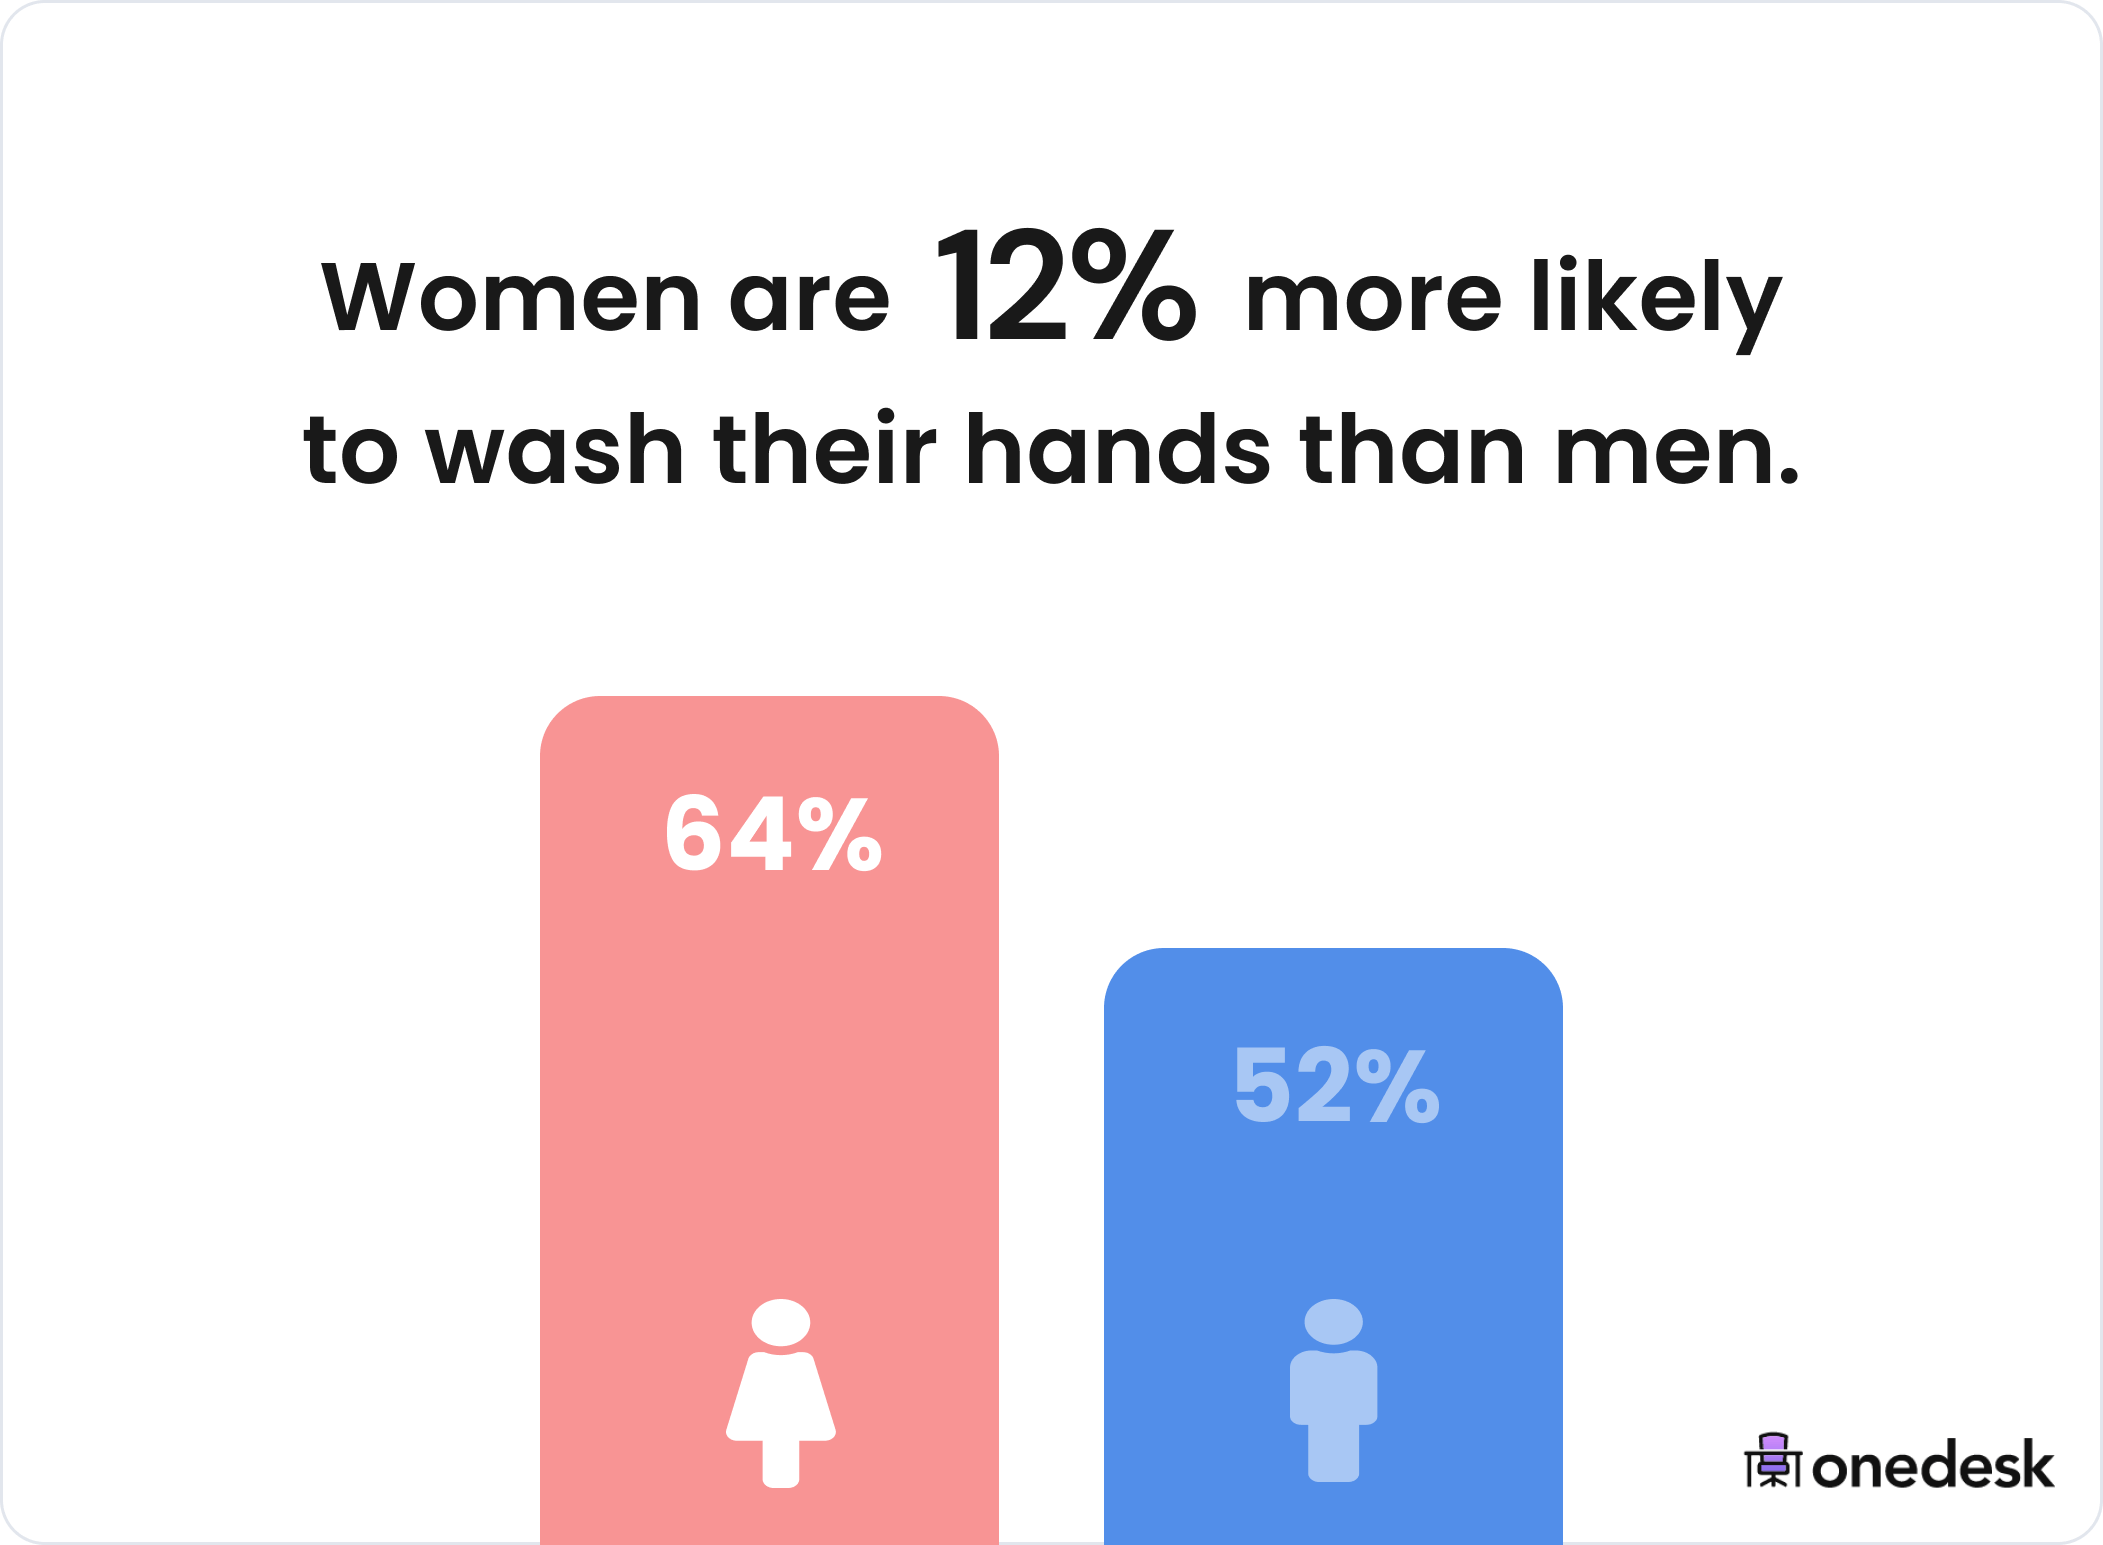 women wash their hands more than men